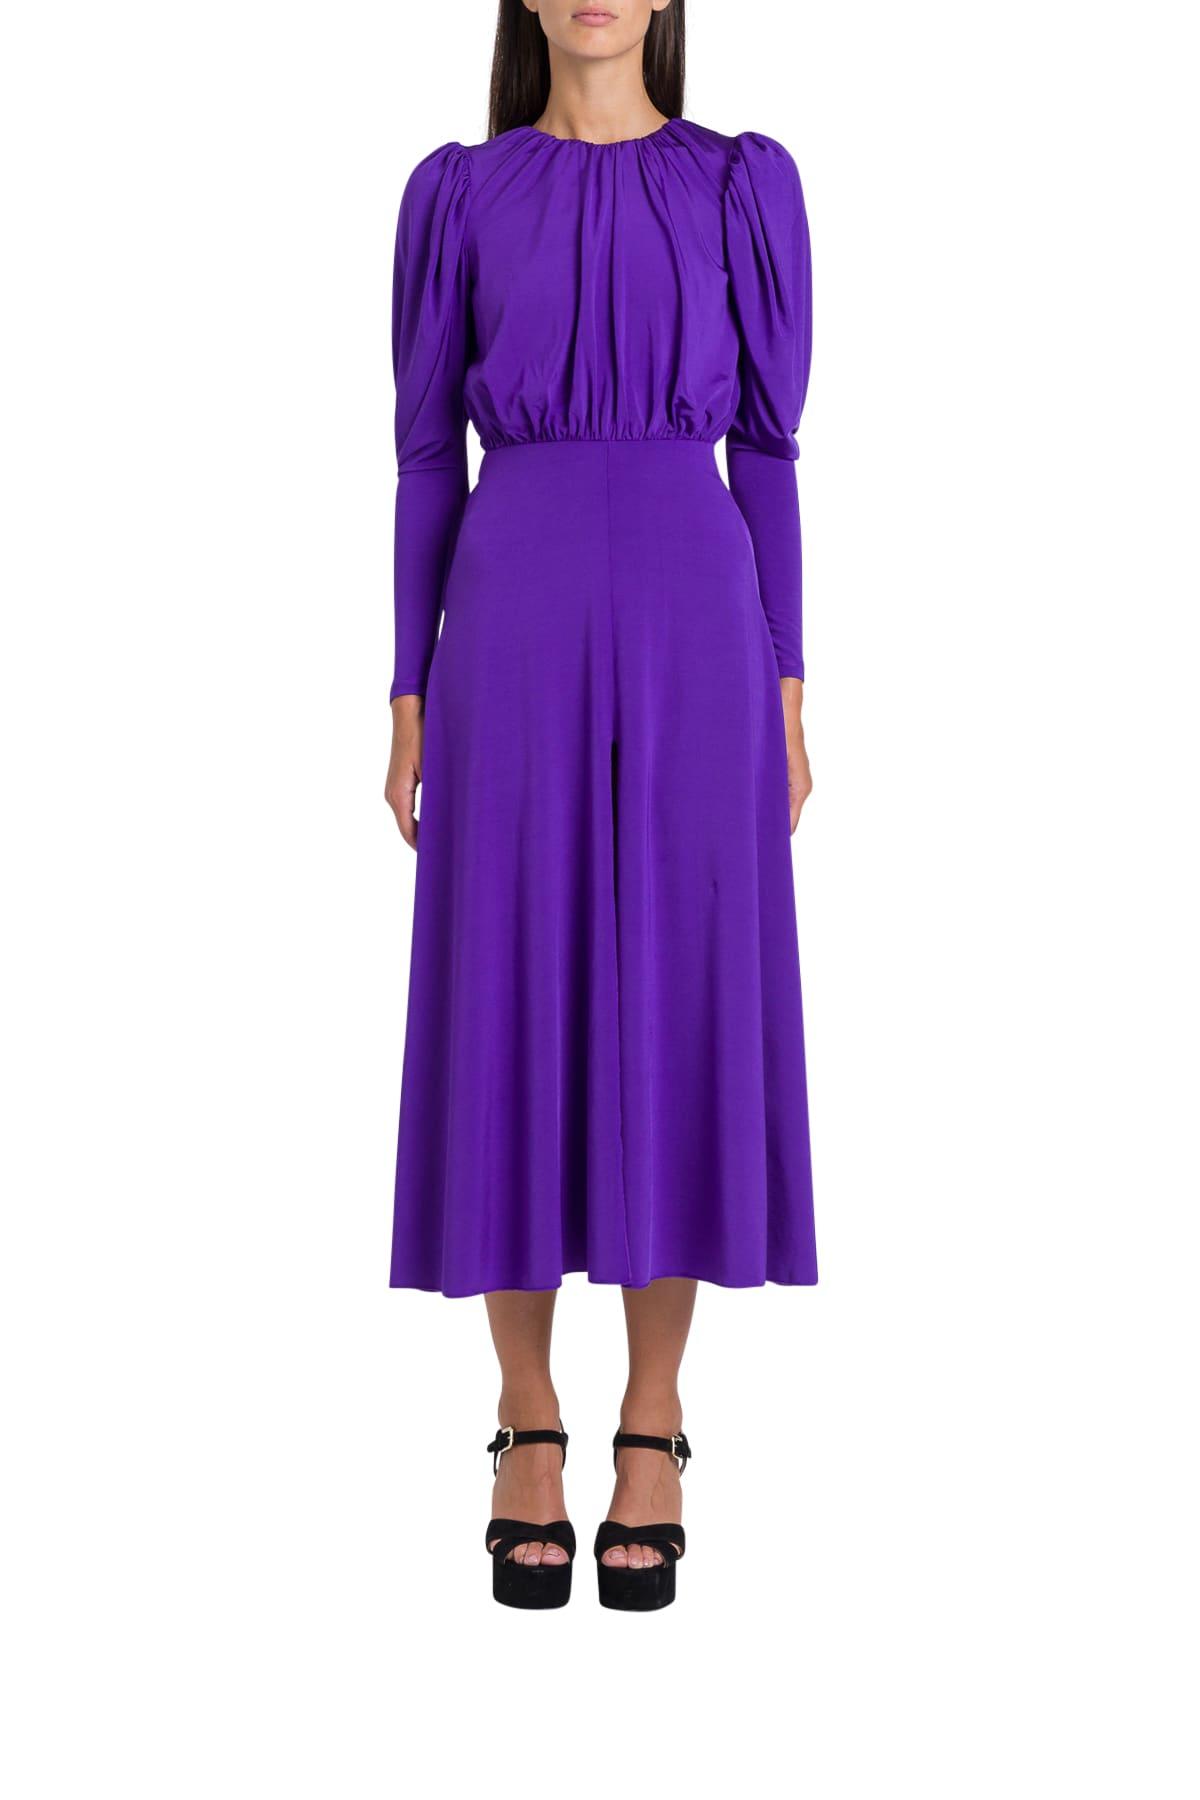 Rotate by Birger Christensen Number 57 Dress